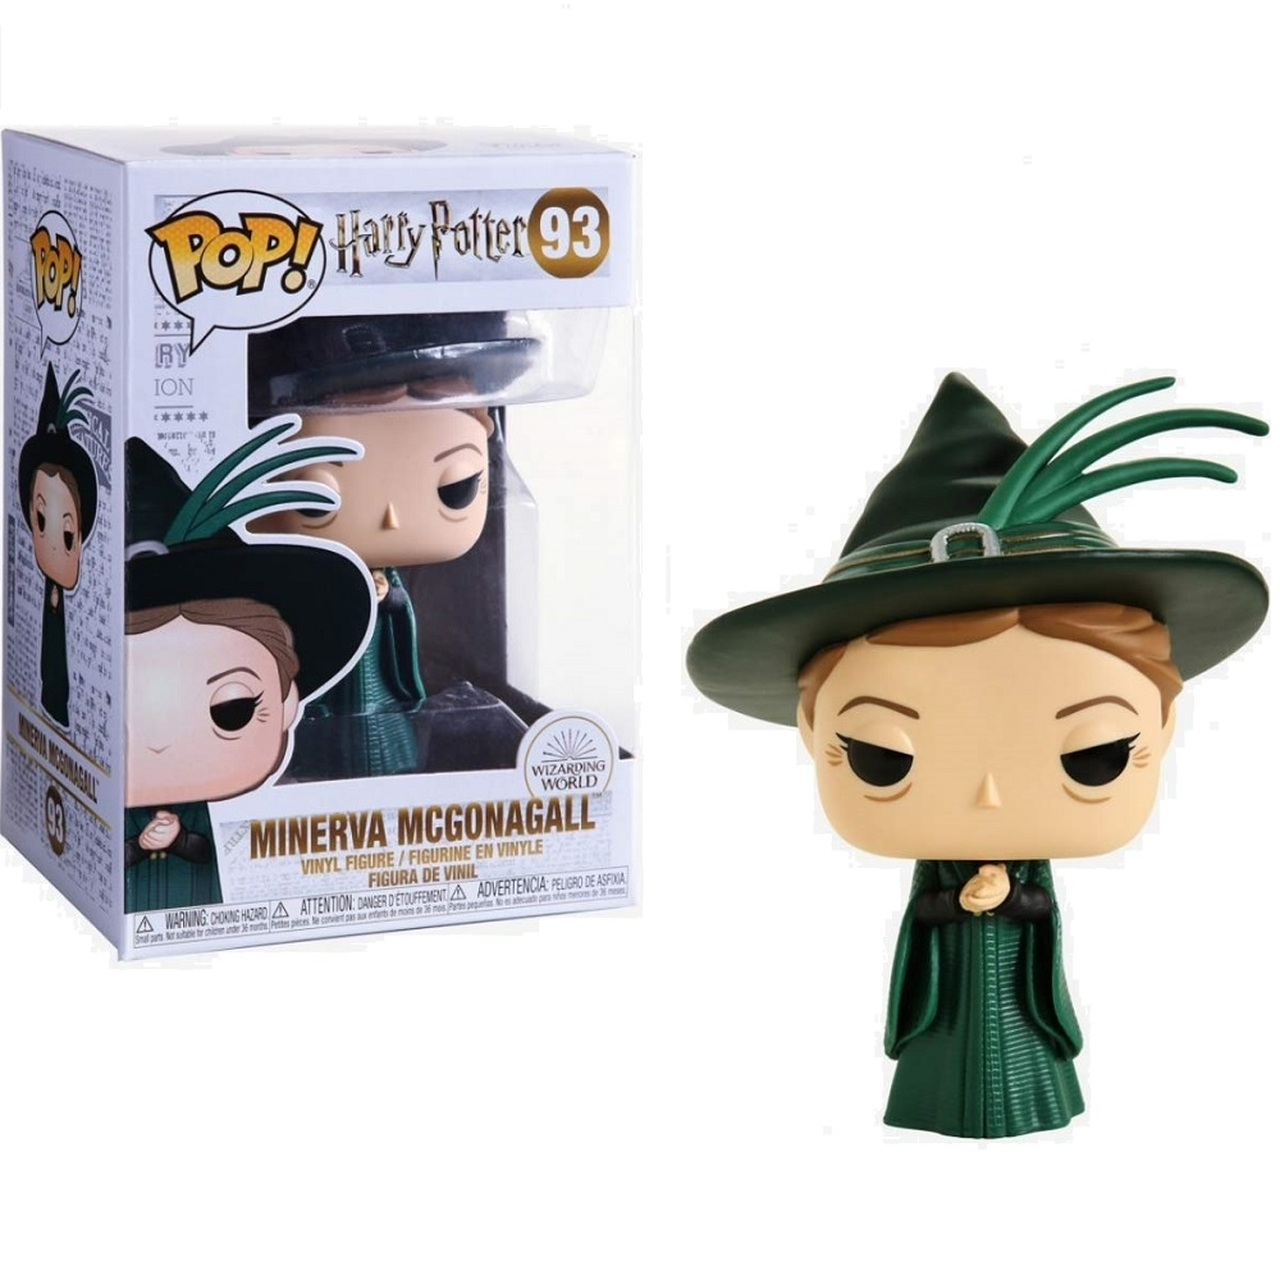 Vinyl Minerva McGonagall Pop Yule Funko--Harry Potter